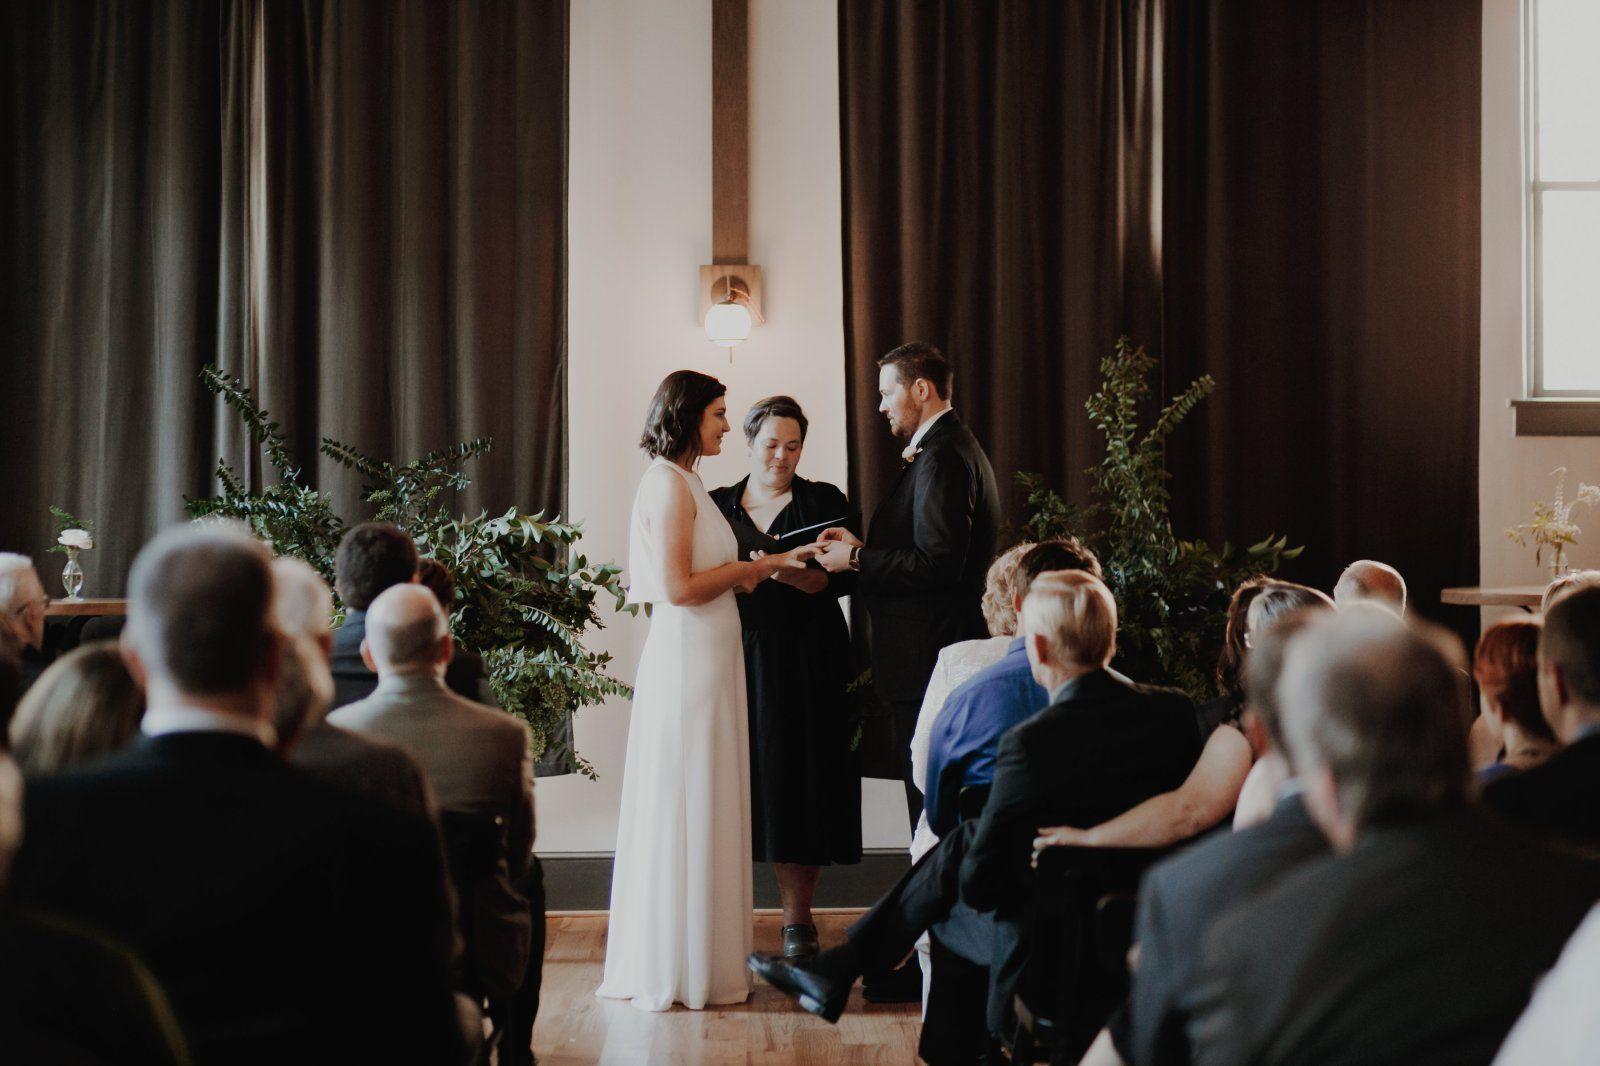 Sydney & Aaron's Modern, Minimalist Wedding at Bridge Club